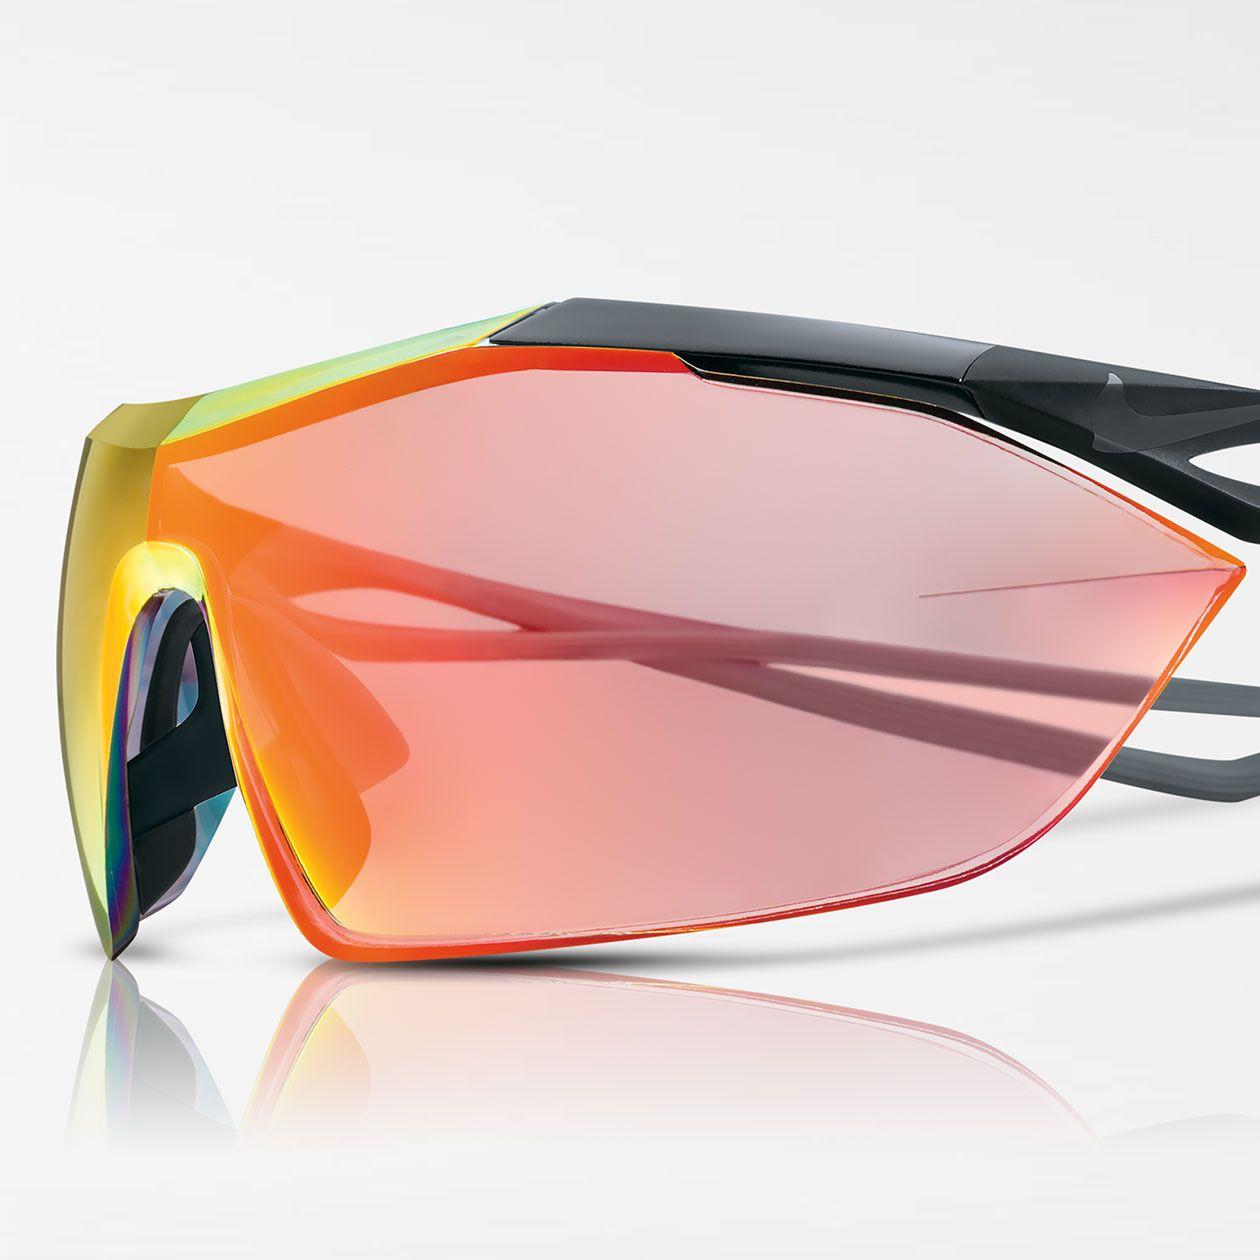 NIKE VAPORWING ELITE Nike Vision Sunglasses, Tinted